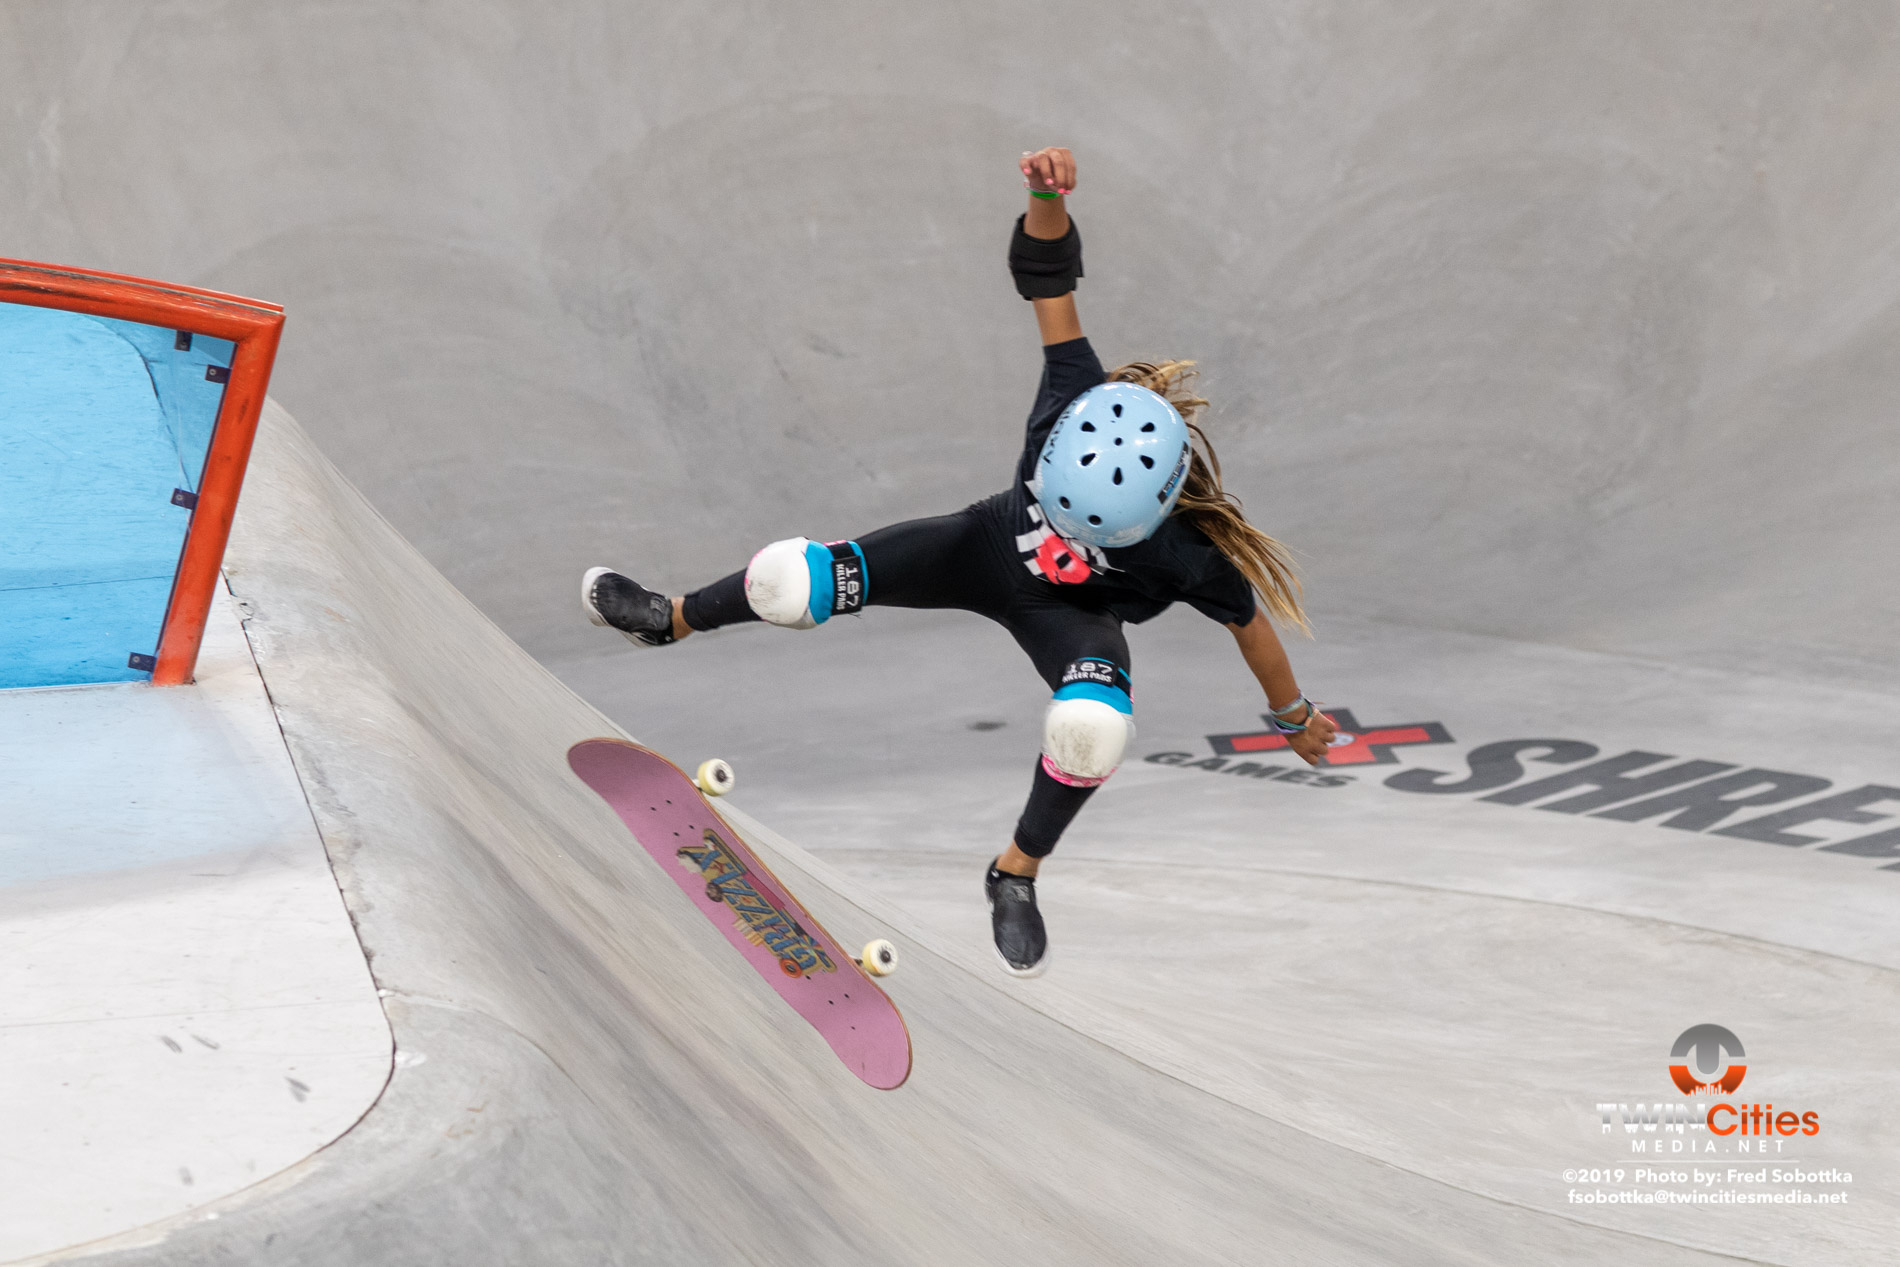 Womens-Skateboard-Park-02